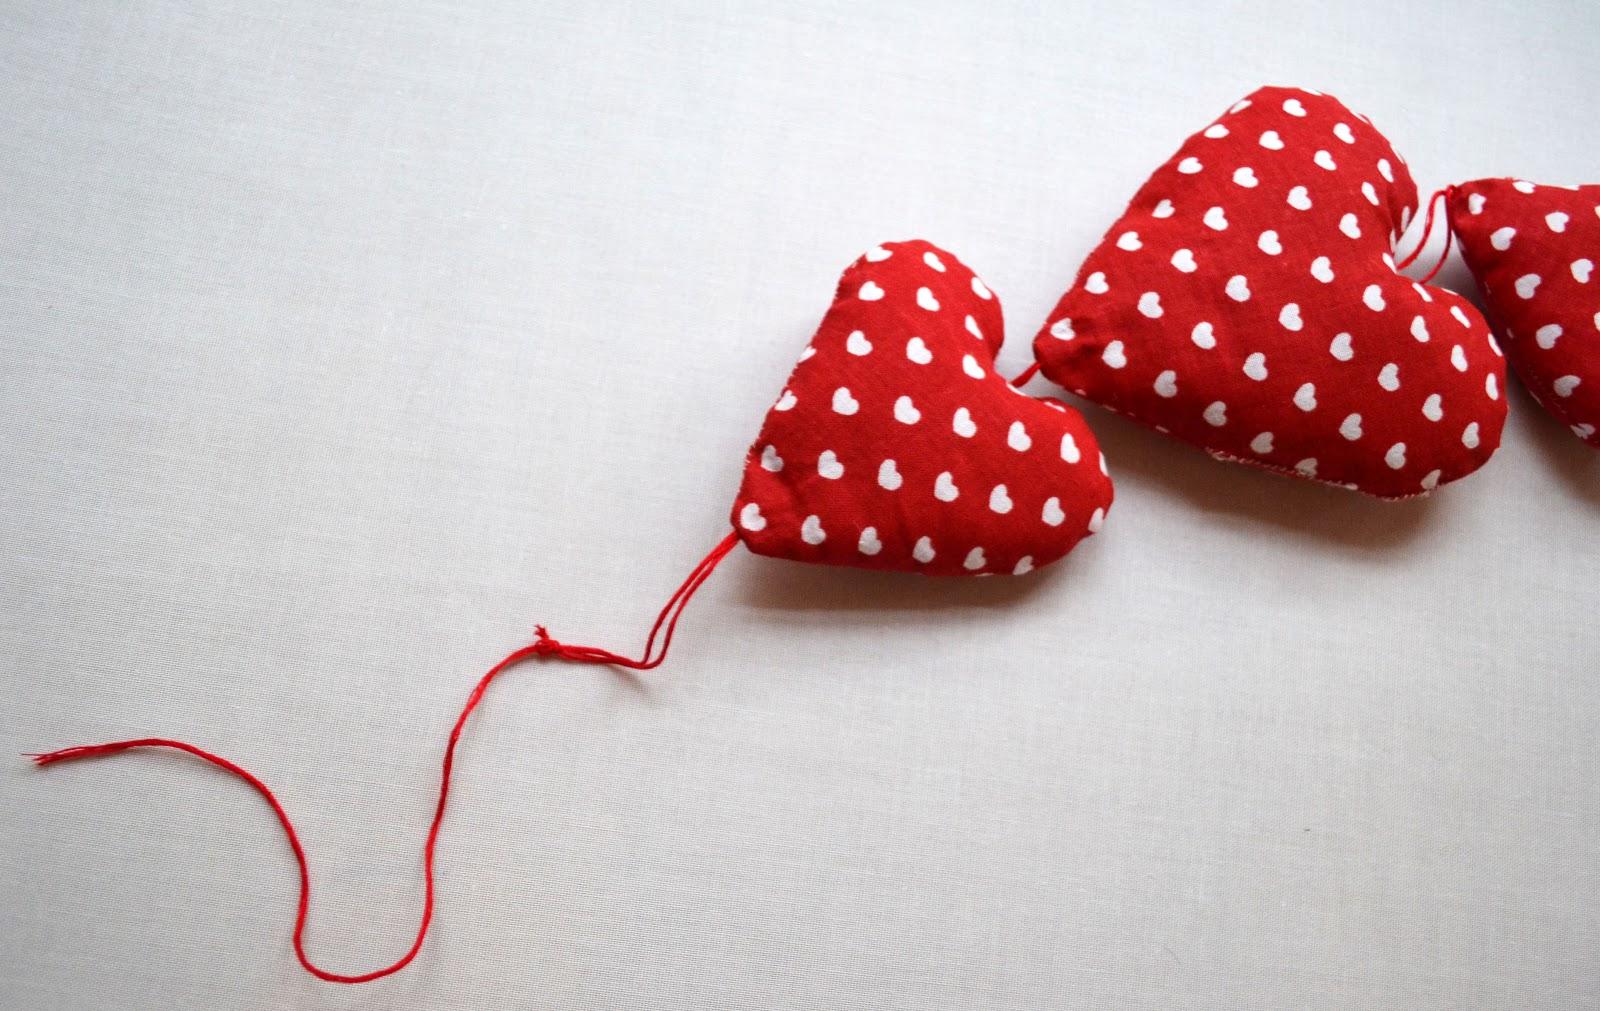 Des+petits+coeurs+en+tissu+DIY+%C3%A0+suspendre+11